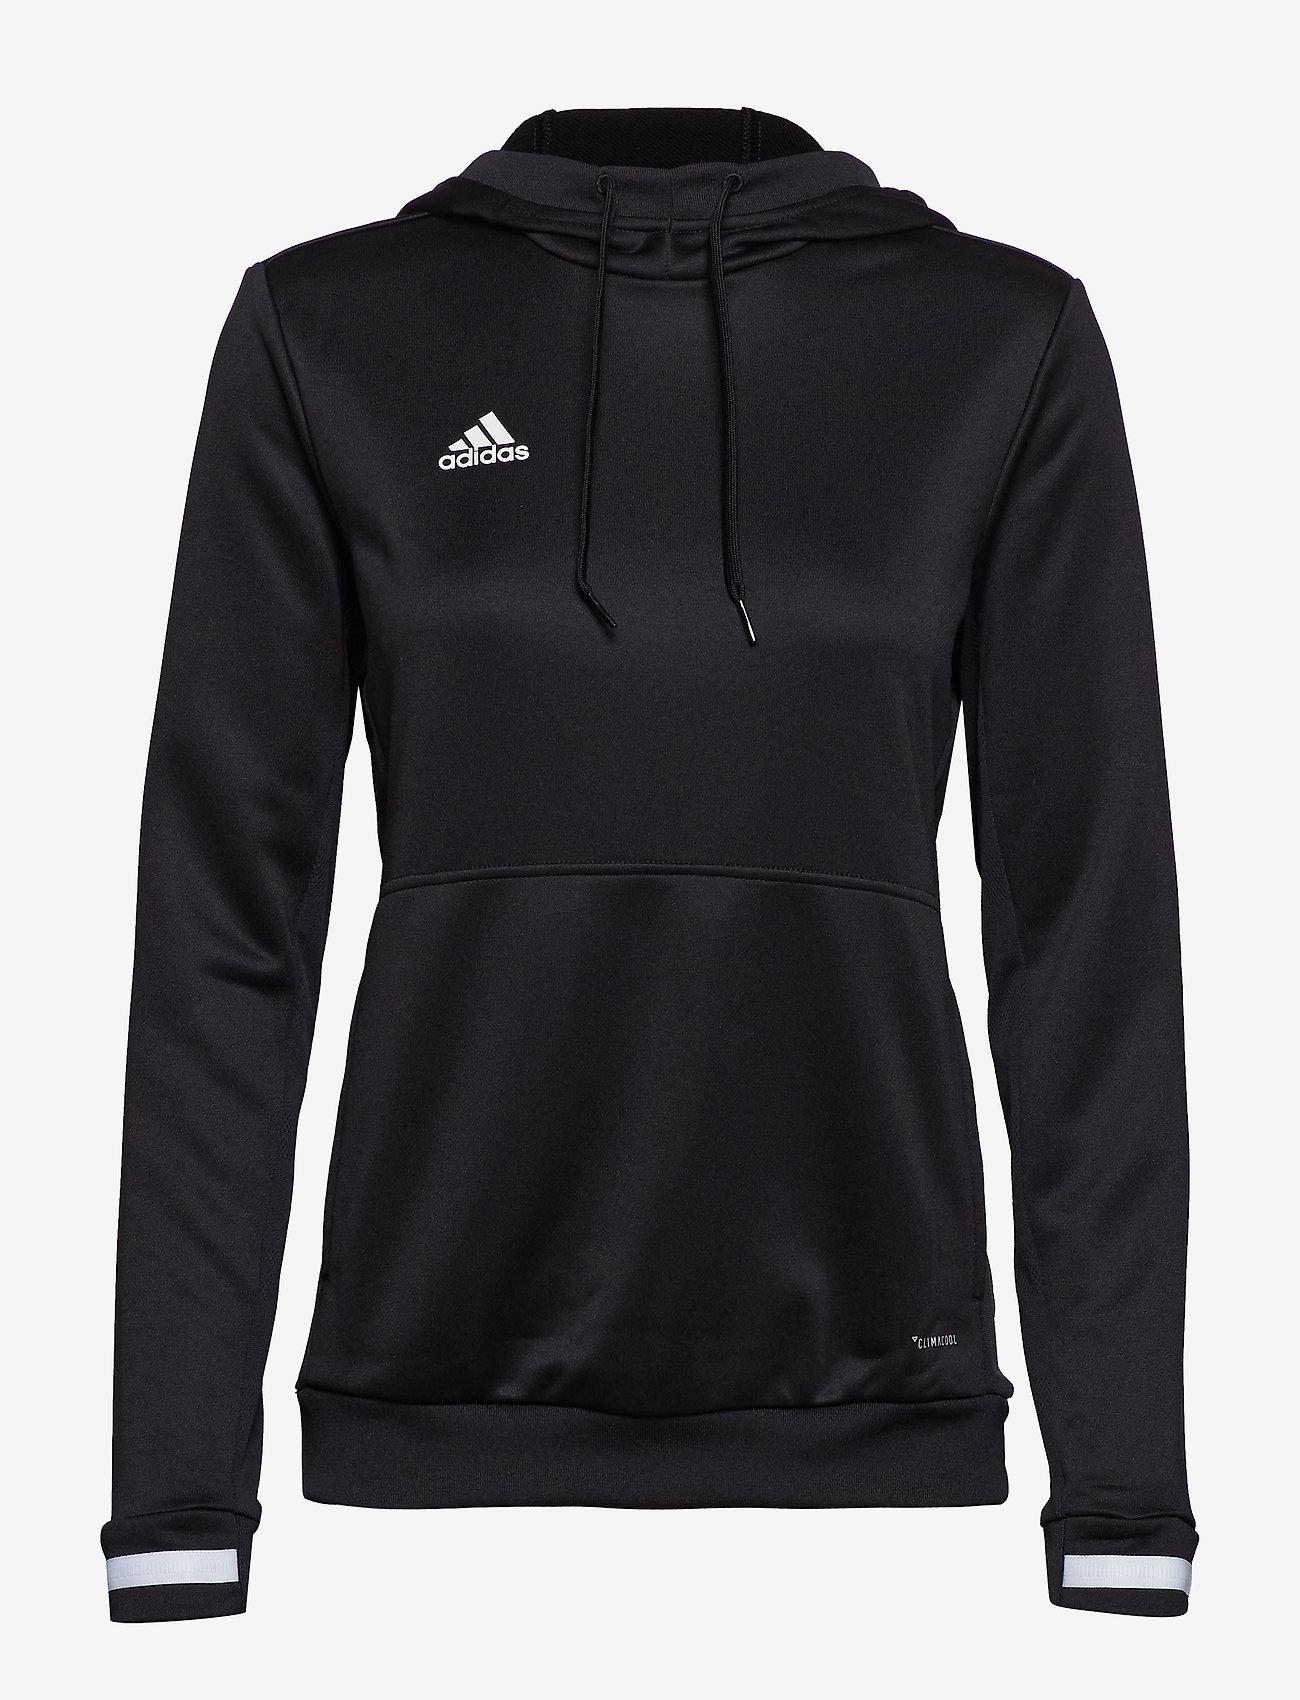 adidas Performance - Team 19 Hoodie W - hættetrøjer - black/white - 1